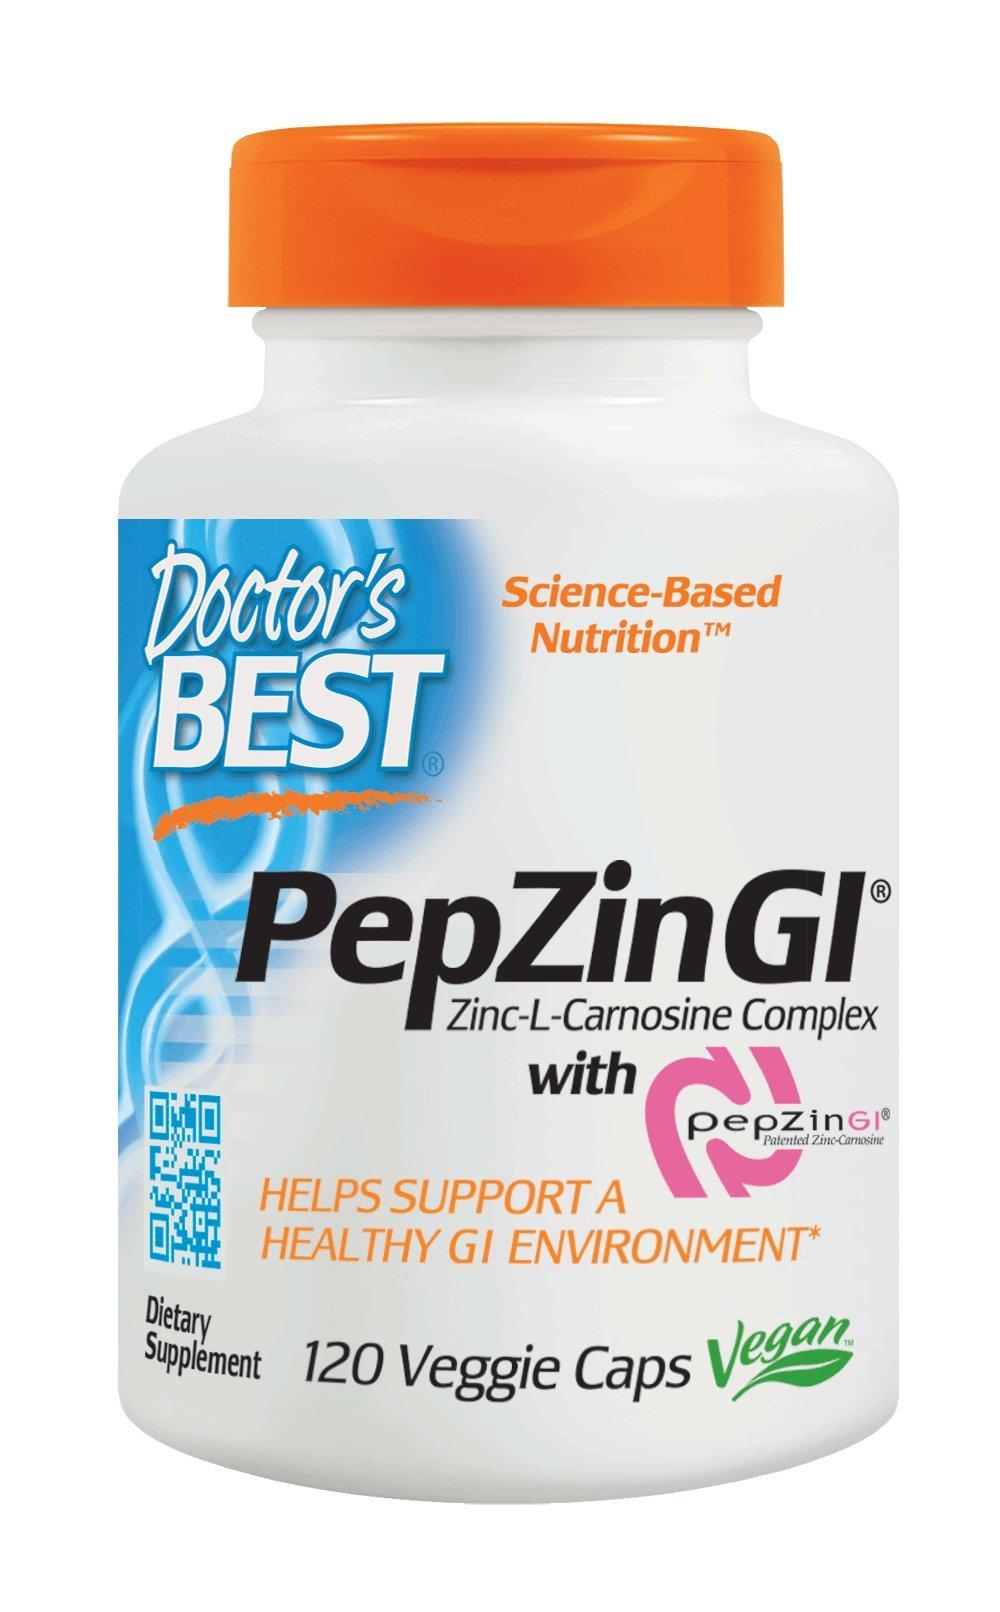 Doctor's Best PepZin GI, Zinc-L-Carnosine Complex, Non-GMO, Vegan, Gluten Free, Soy Free, Digestive Support, 120 Veggie Caps